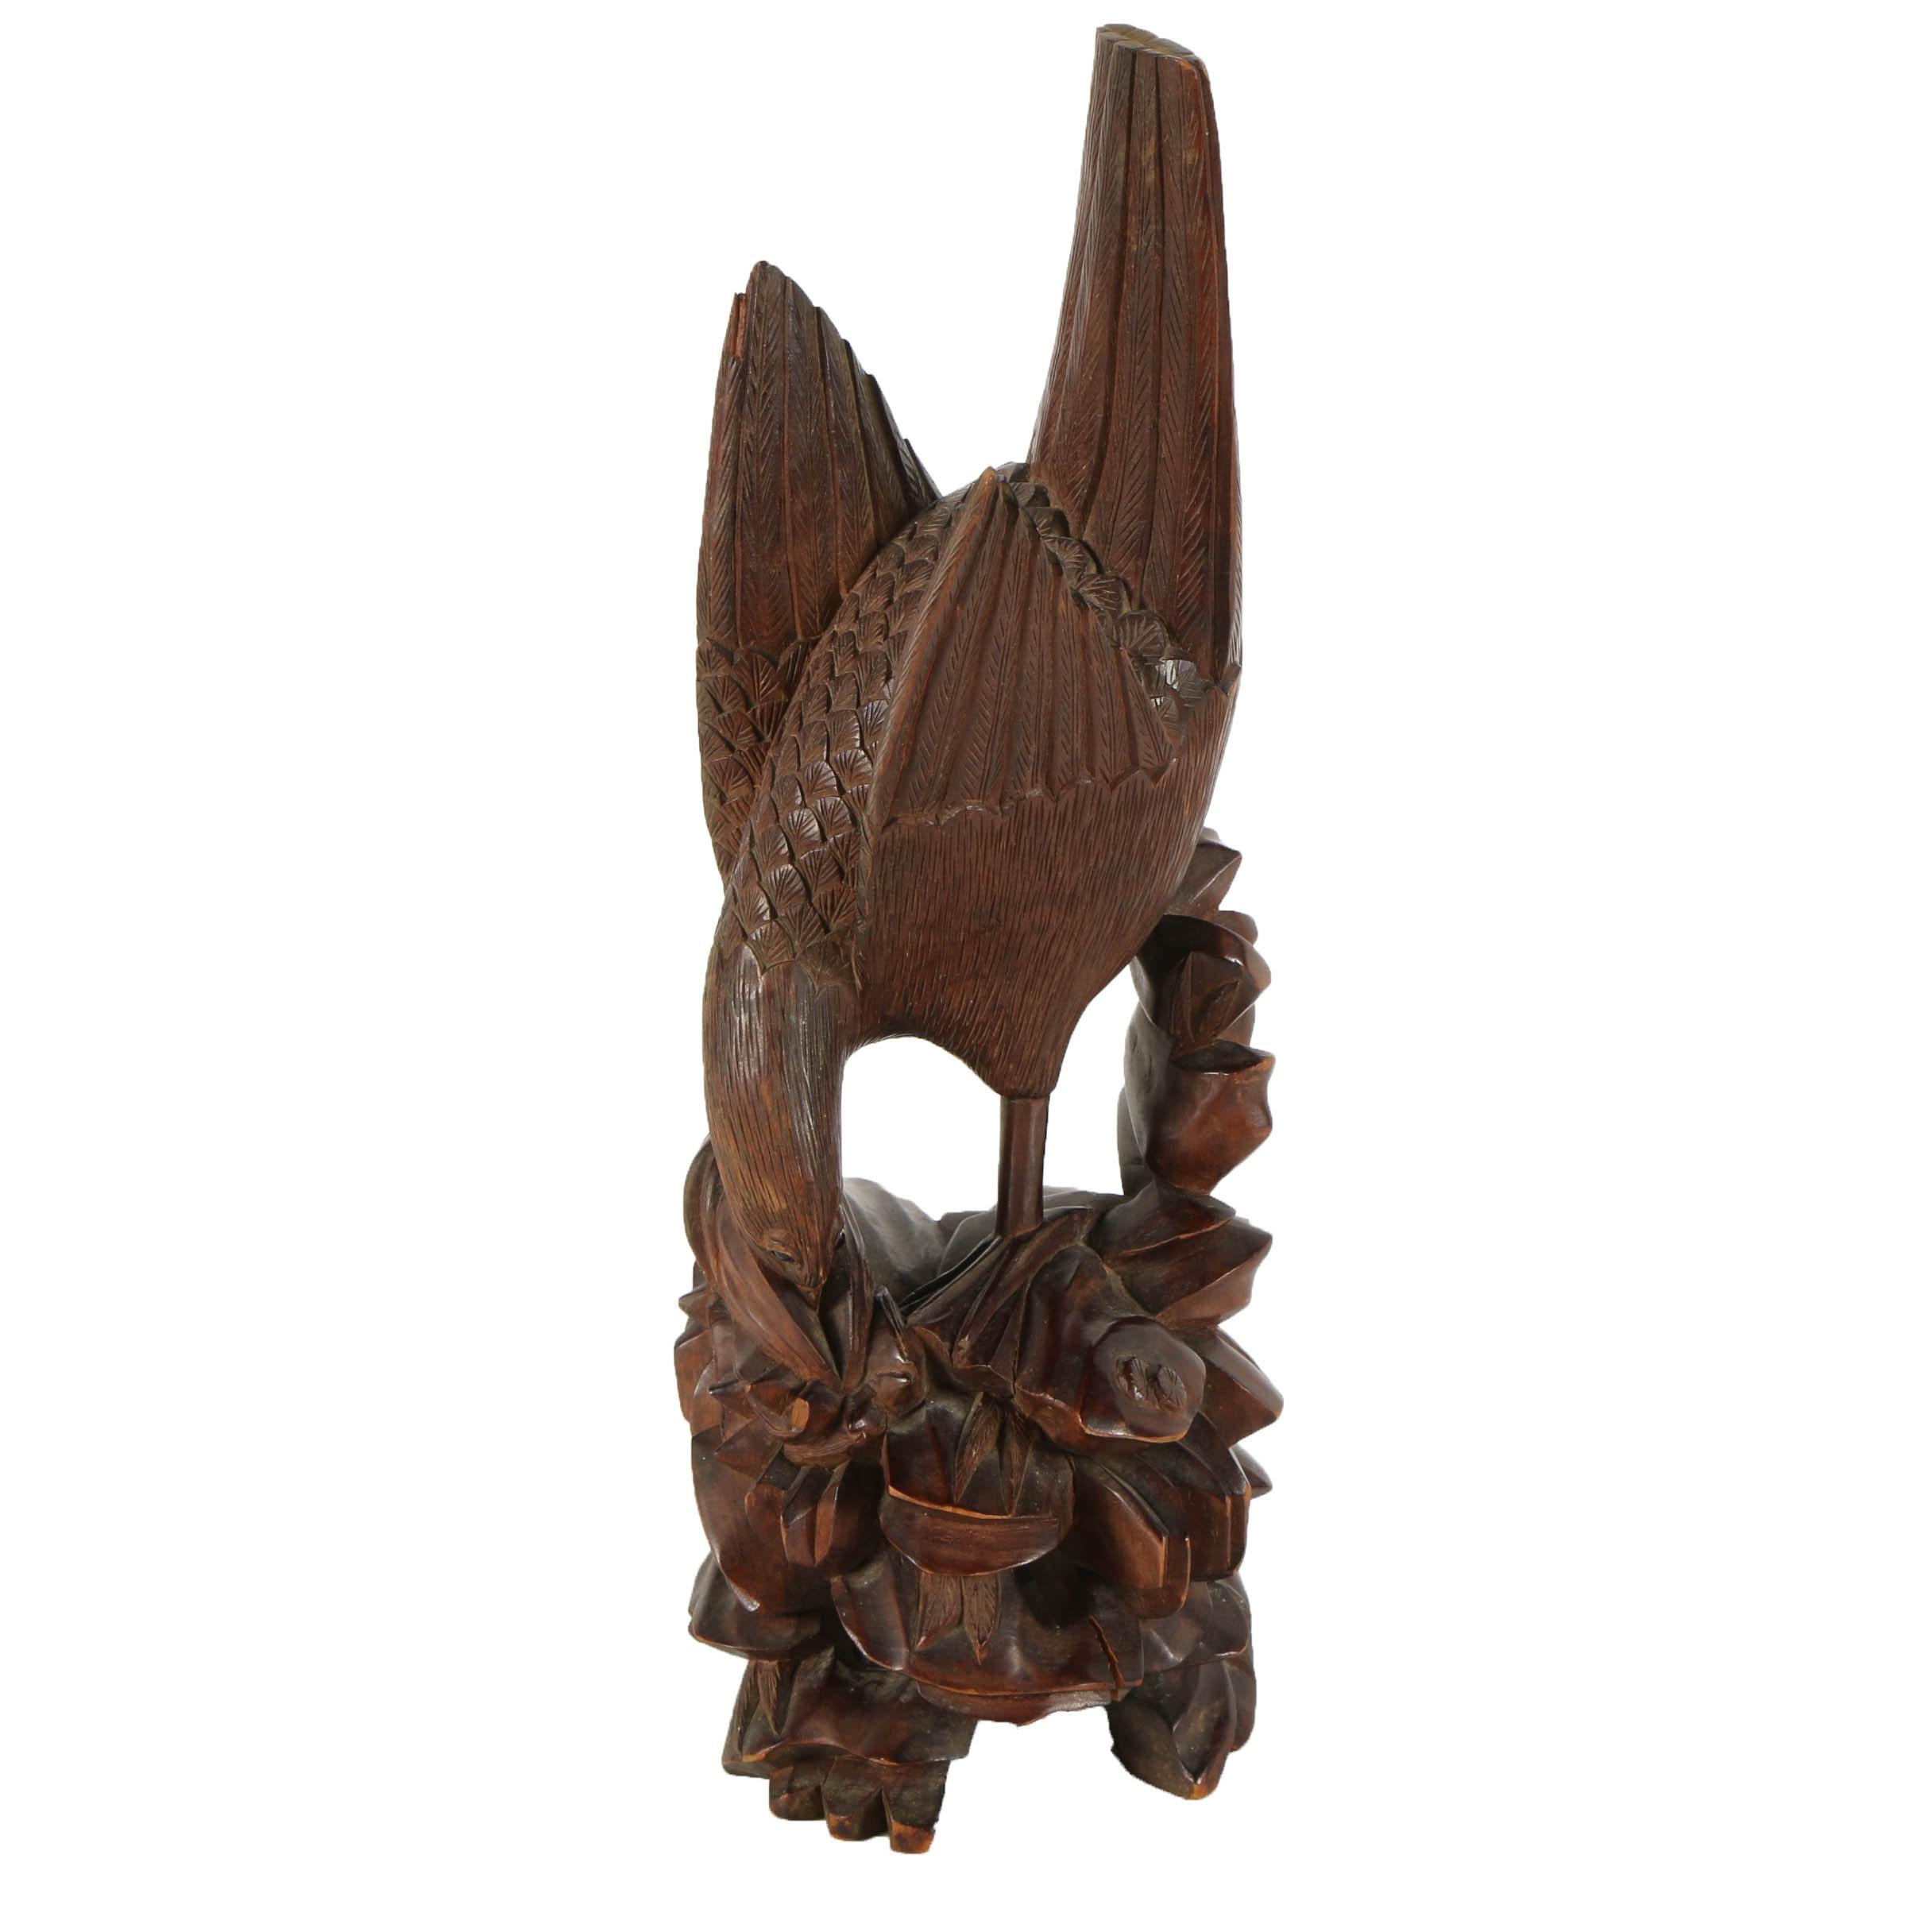 Japanese Wood Sculpture of Sea Bird